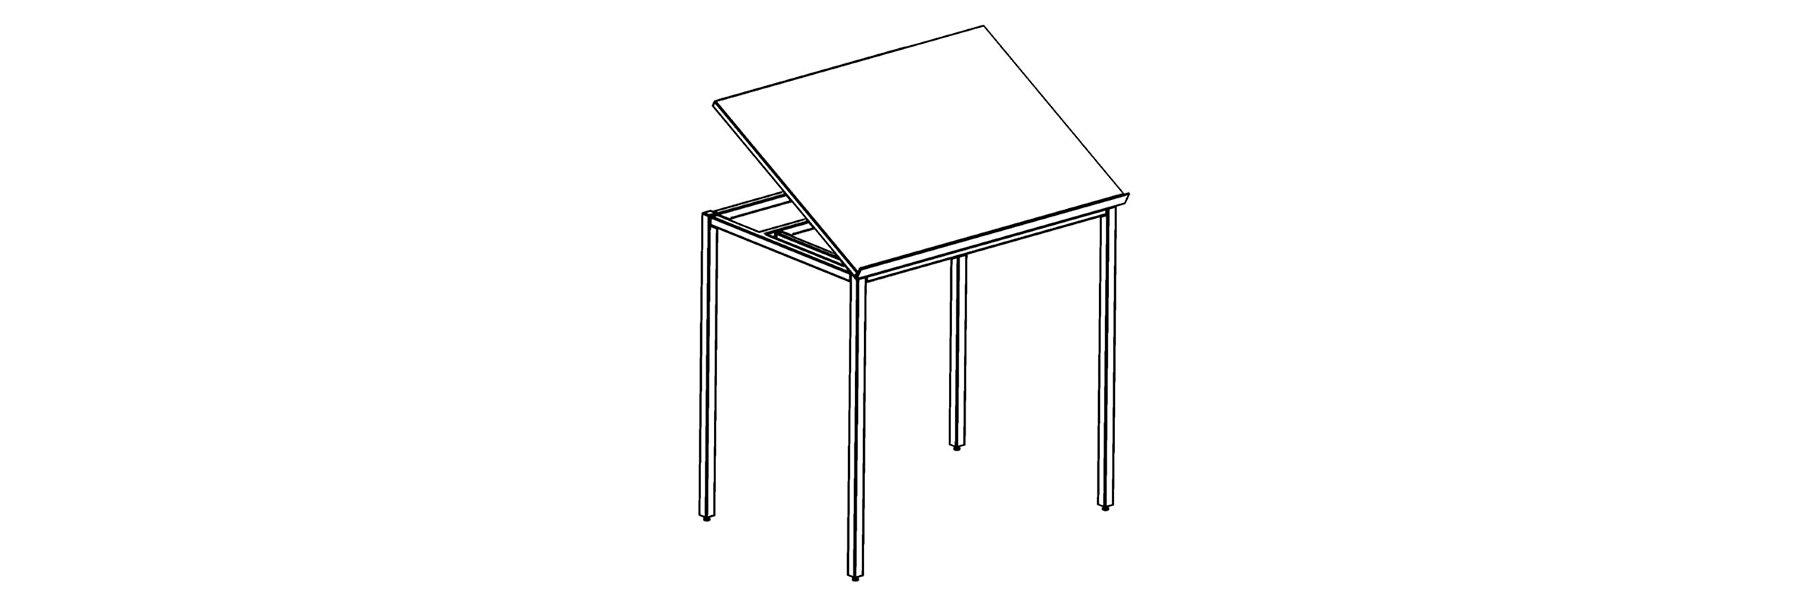 Corilam 660 Full Tilting Drafting Table